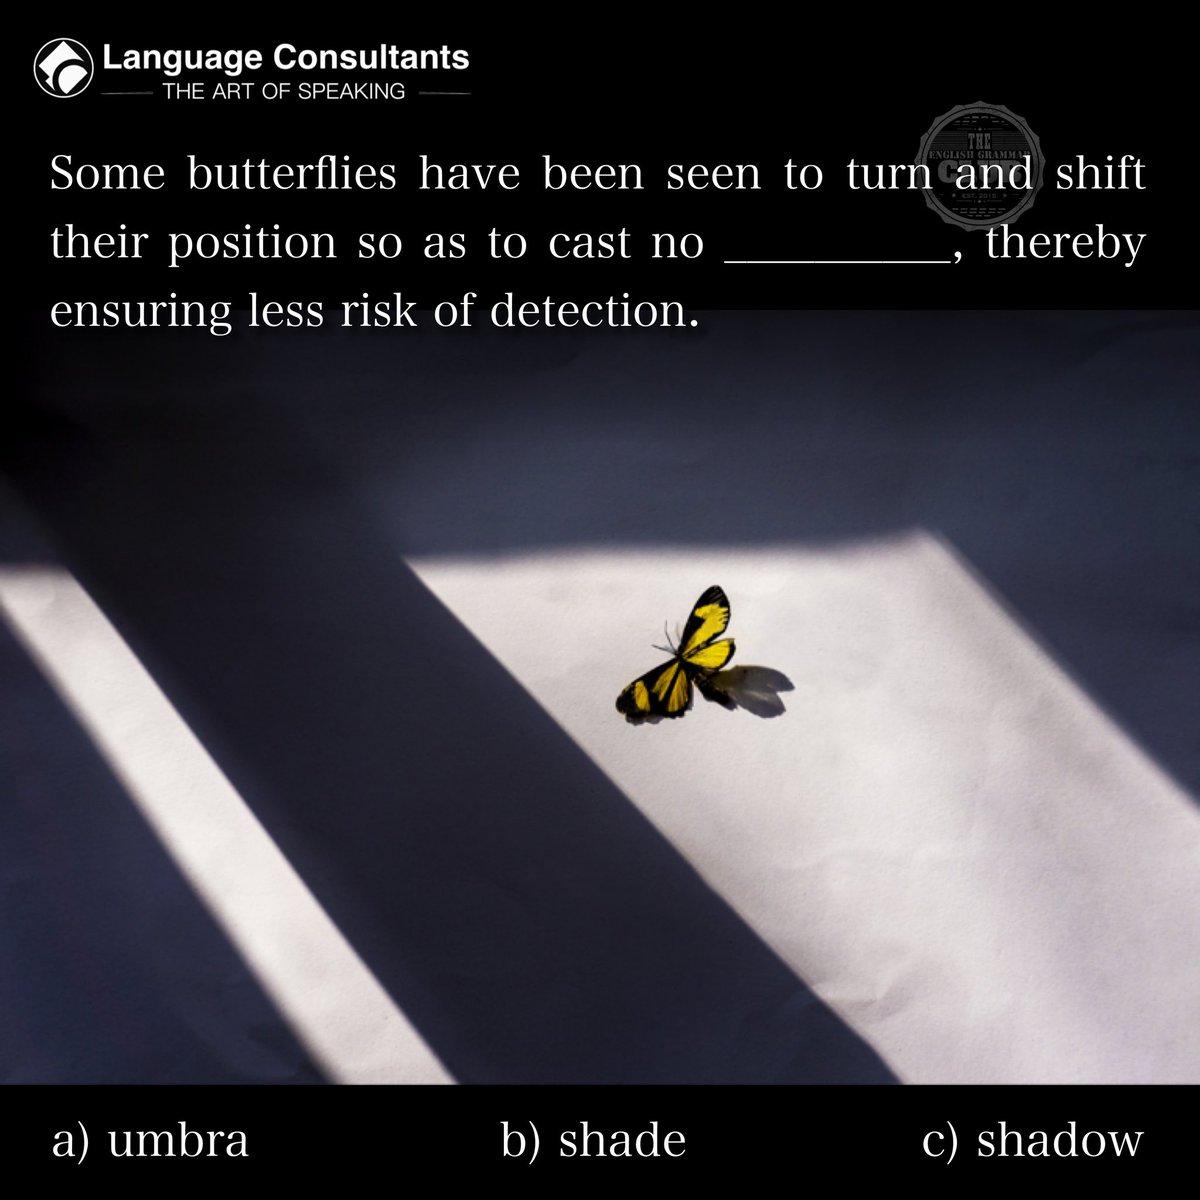 #english 🇬🇧 #englishlearning #learnenglish #language #butterfly #butterflyworld #butterflywings #butterflylovers #butterflygarden #butterflies🦋 https://t.co/ybrsS4PqXG